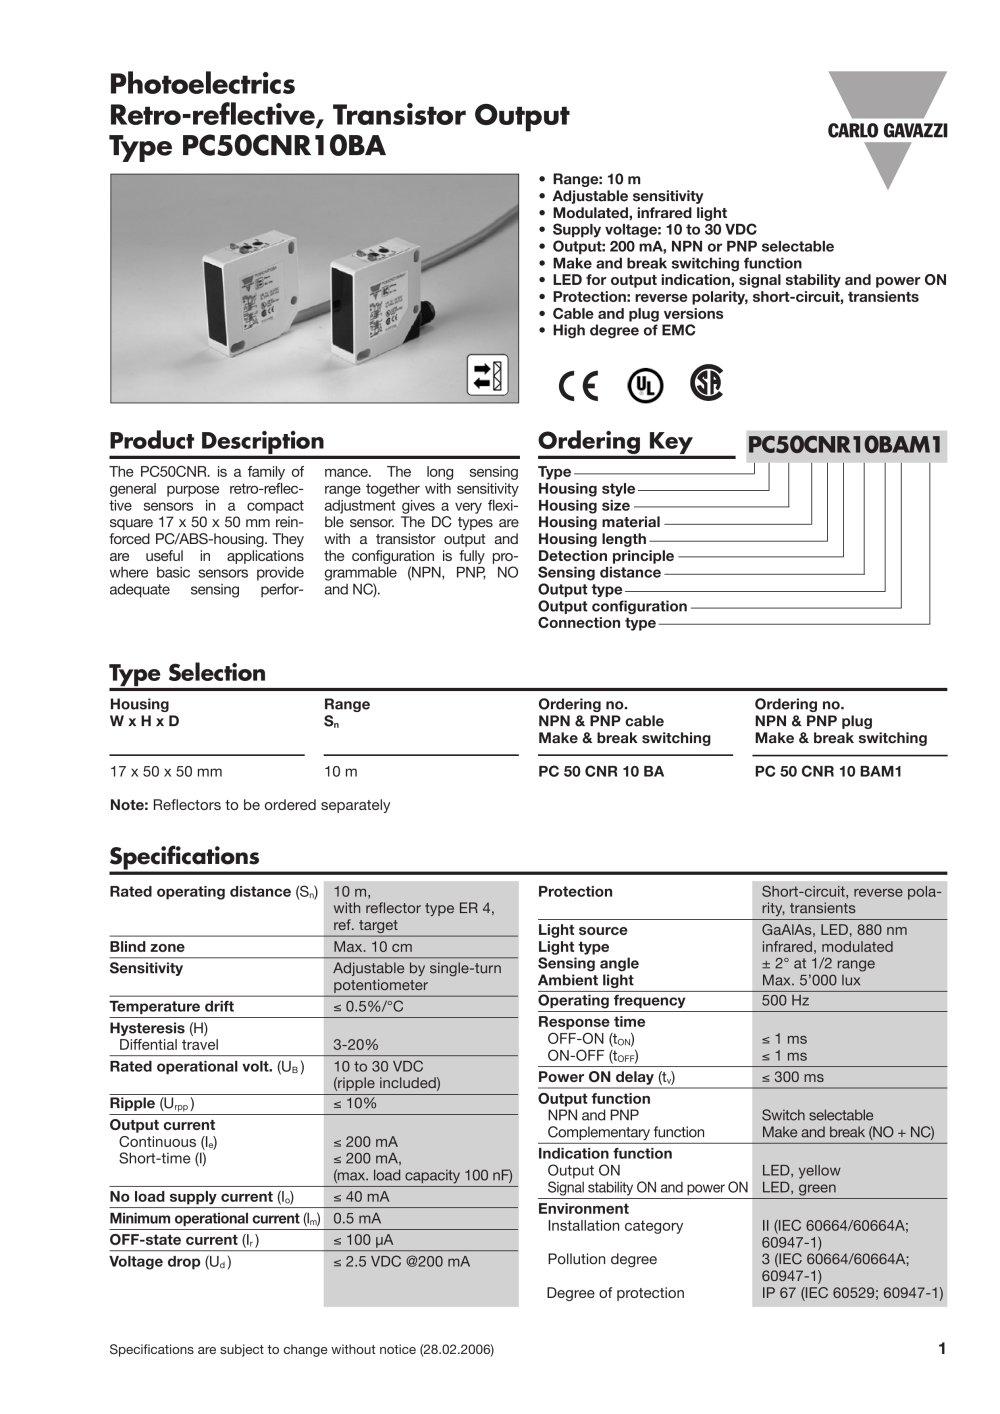 Photoelectrics Retro-reflective, Transistor Output Type PC50CNR10BA ...